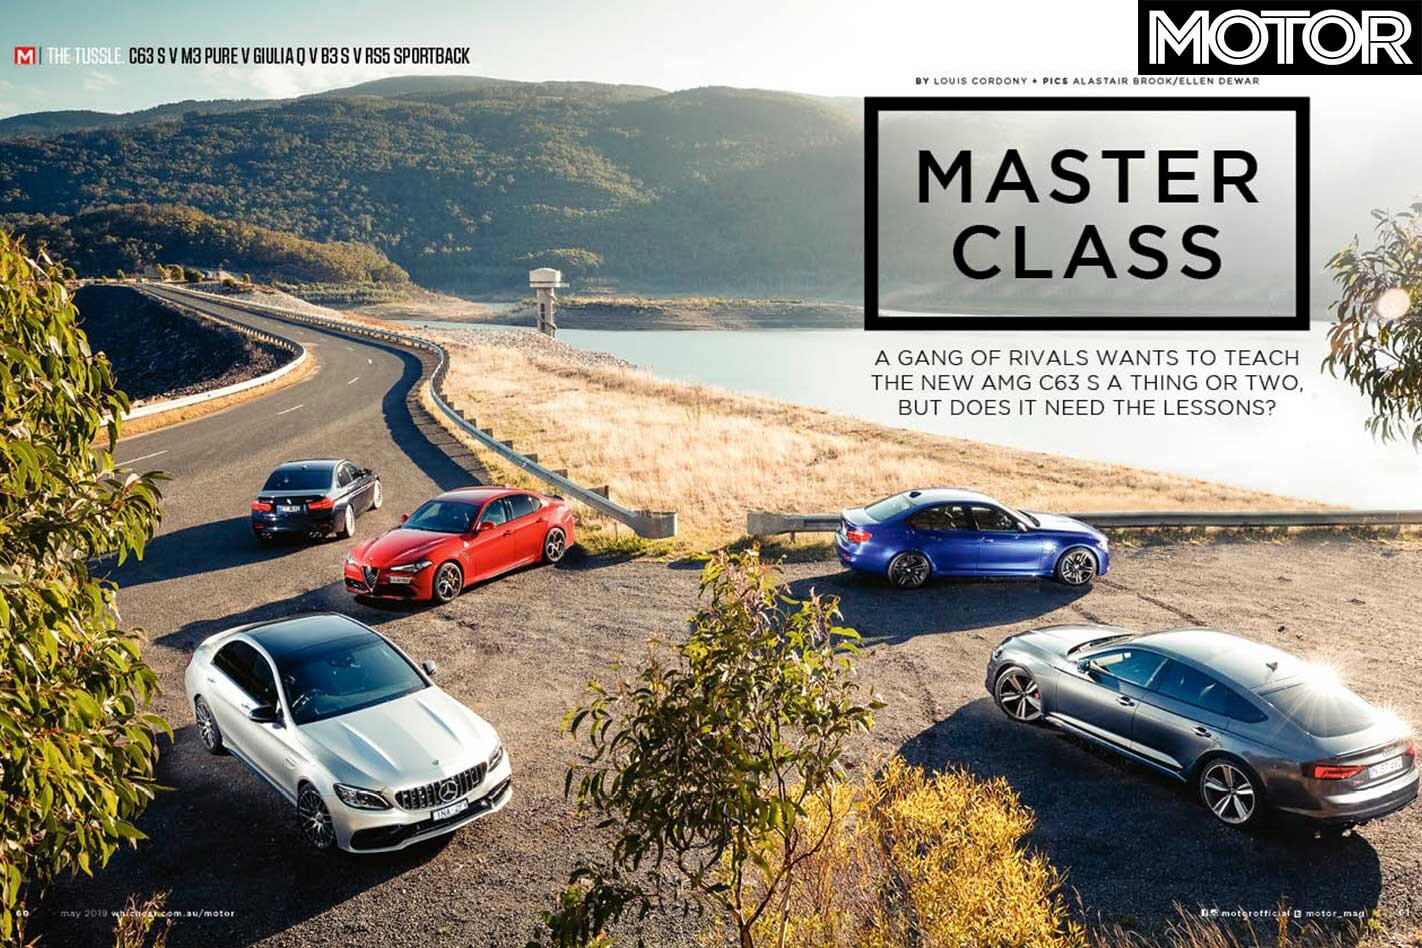 MOTOR Magazine May 2019 Issue Preview AMG C 63 S V M 3 Pure V RS 5 V Giulia Q V Alpina B 3 S Jpg